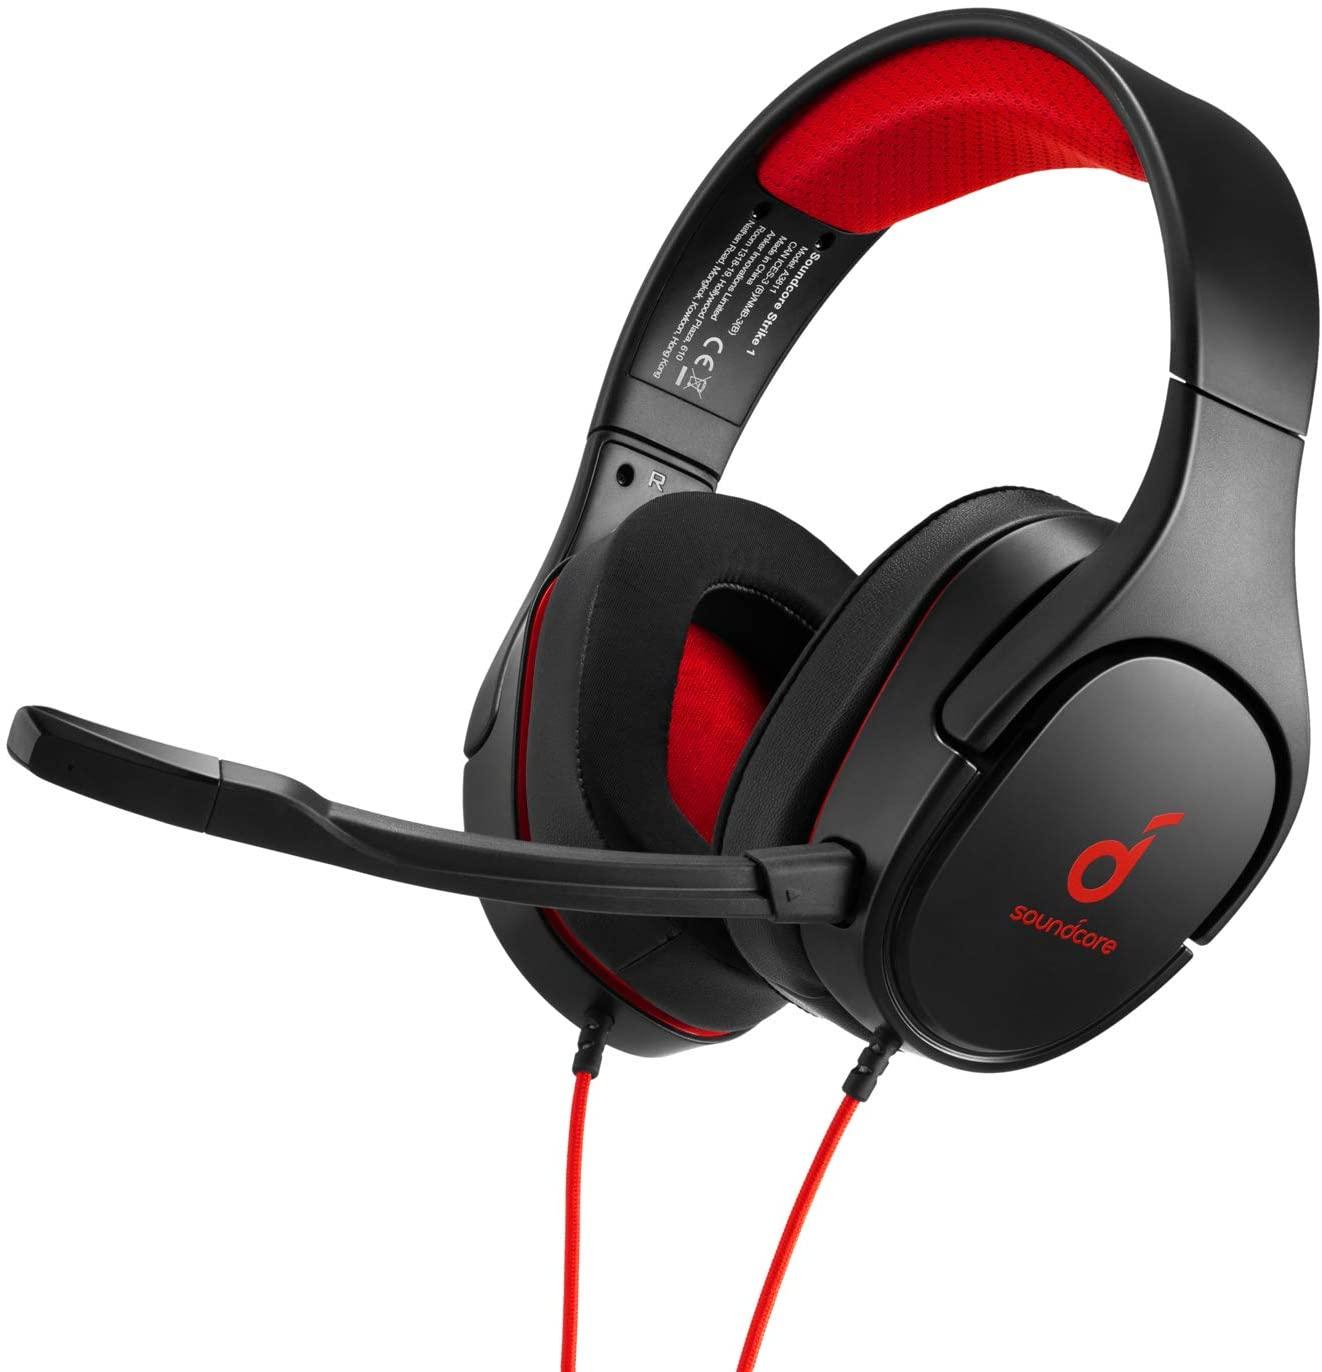 Soundcore Strike 1 Gaming Headset